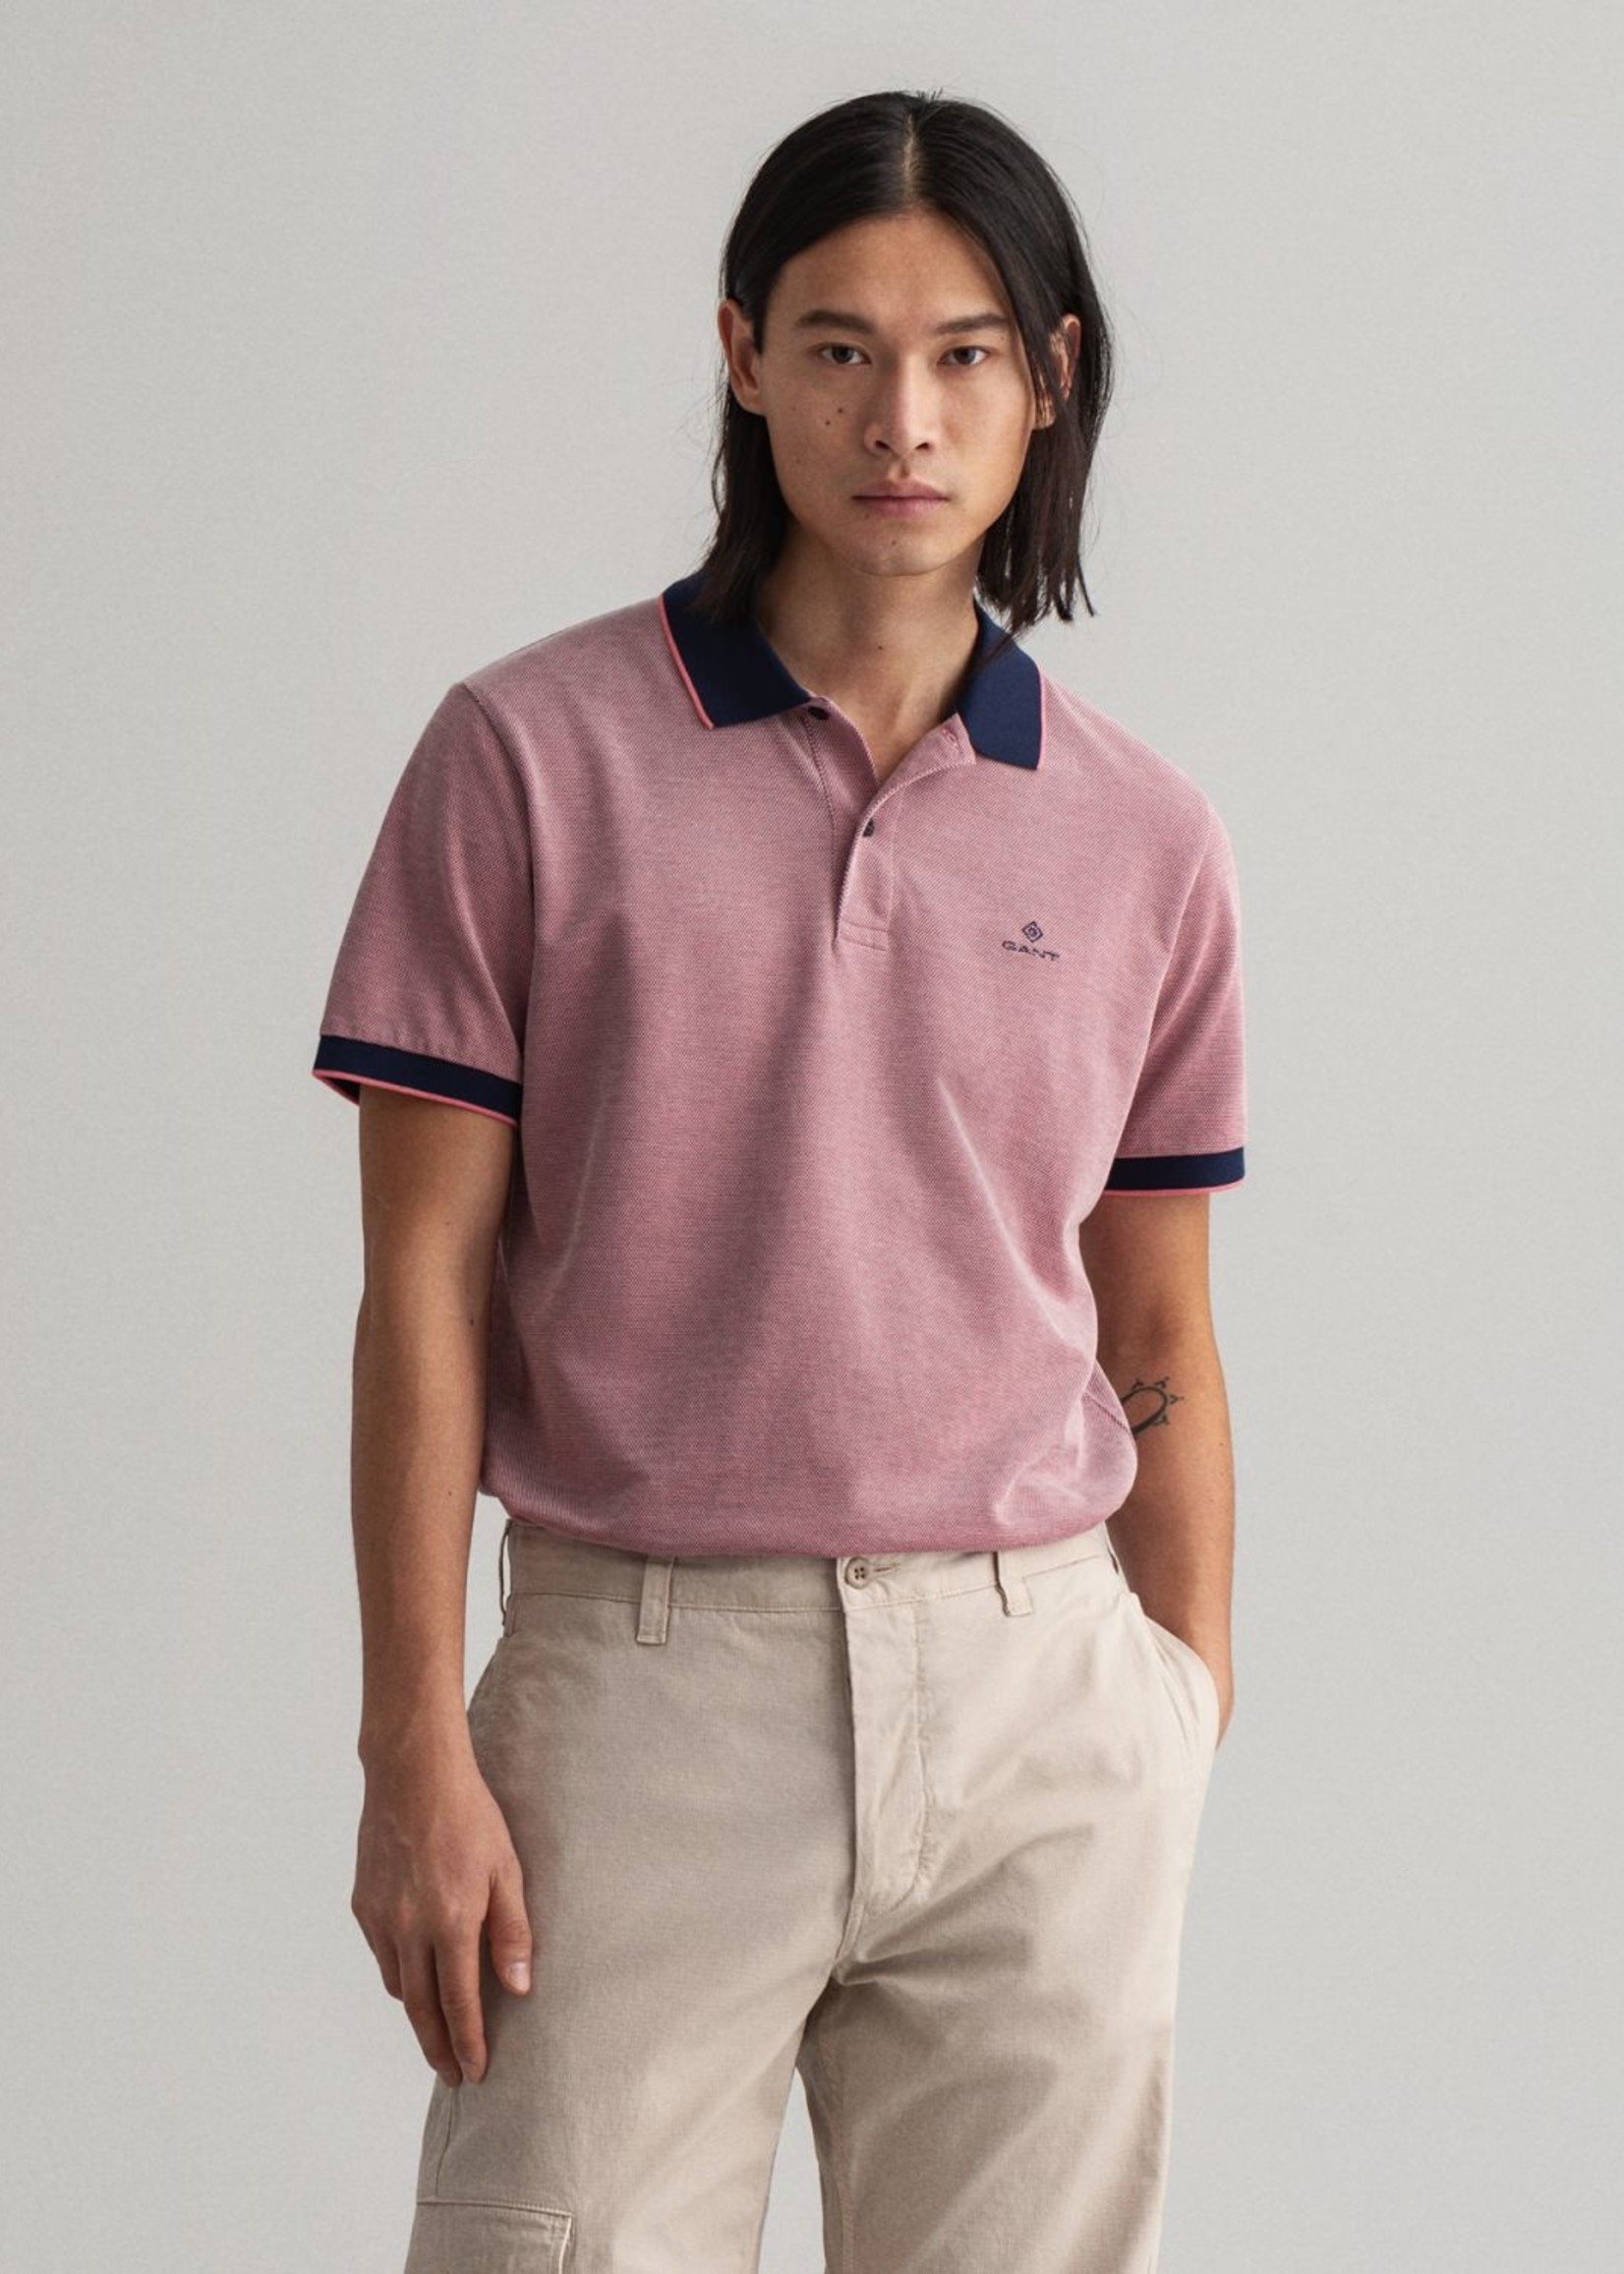 GANT Polo Rugger Oxford en coton piqué quadricolore | Rose | GANT